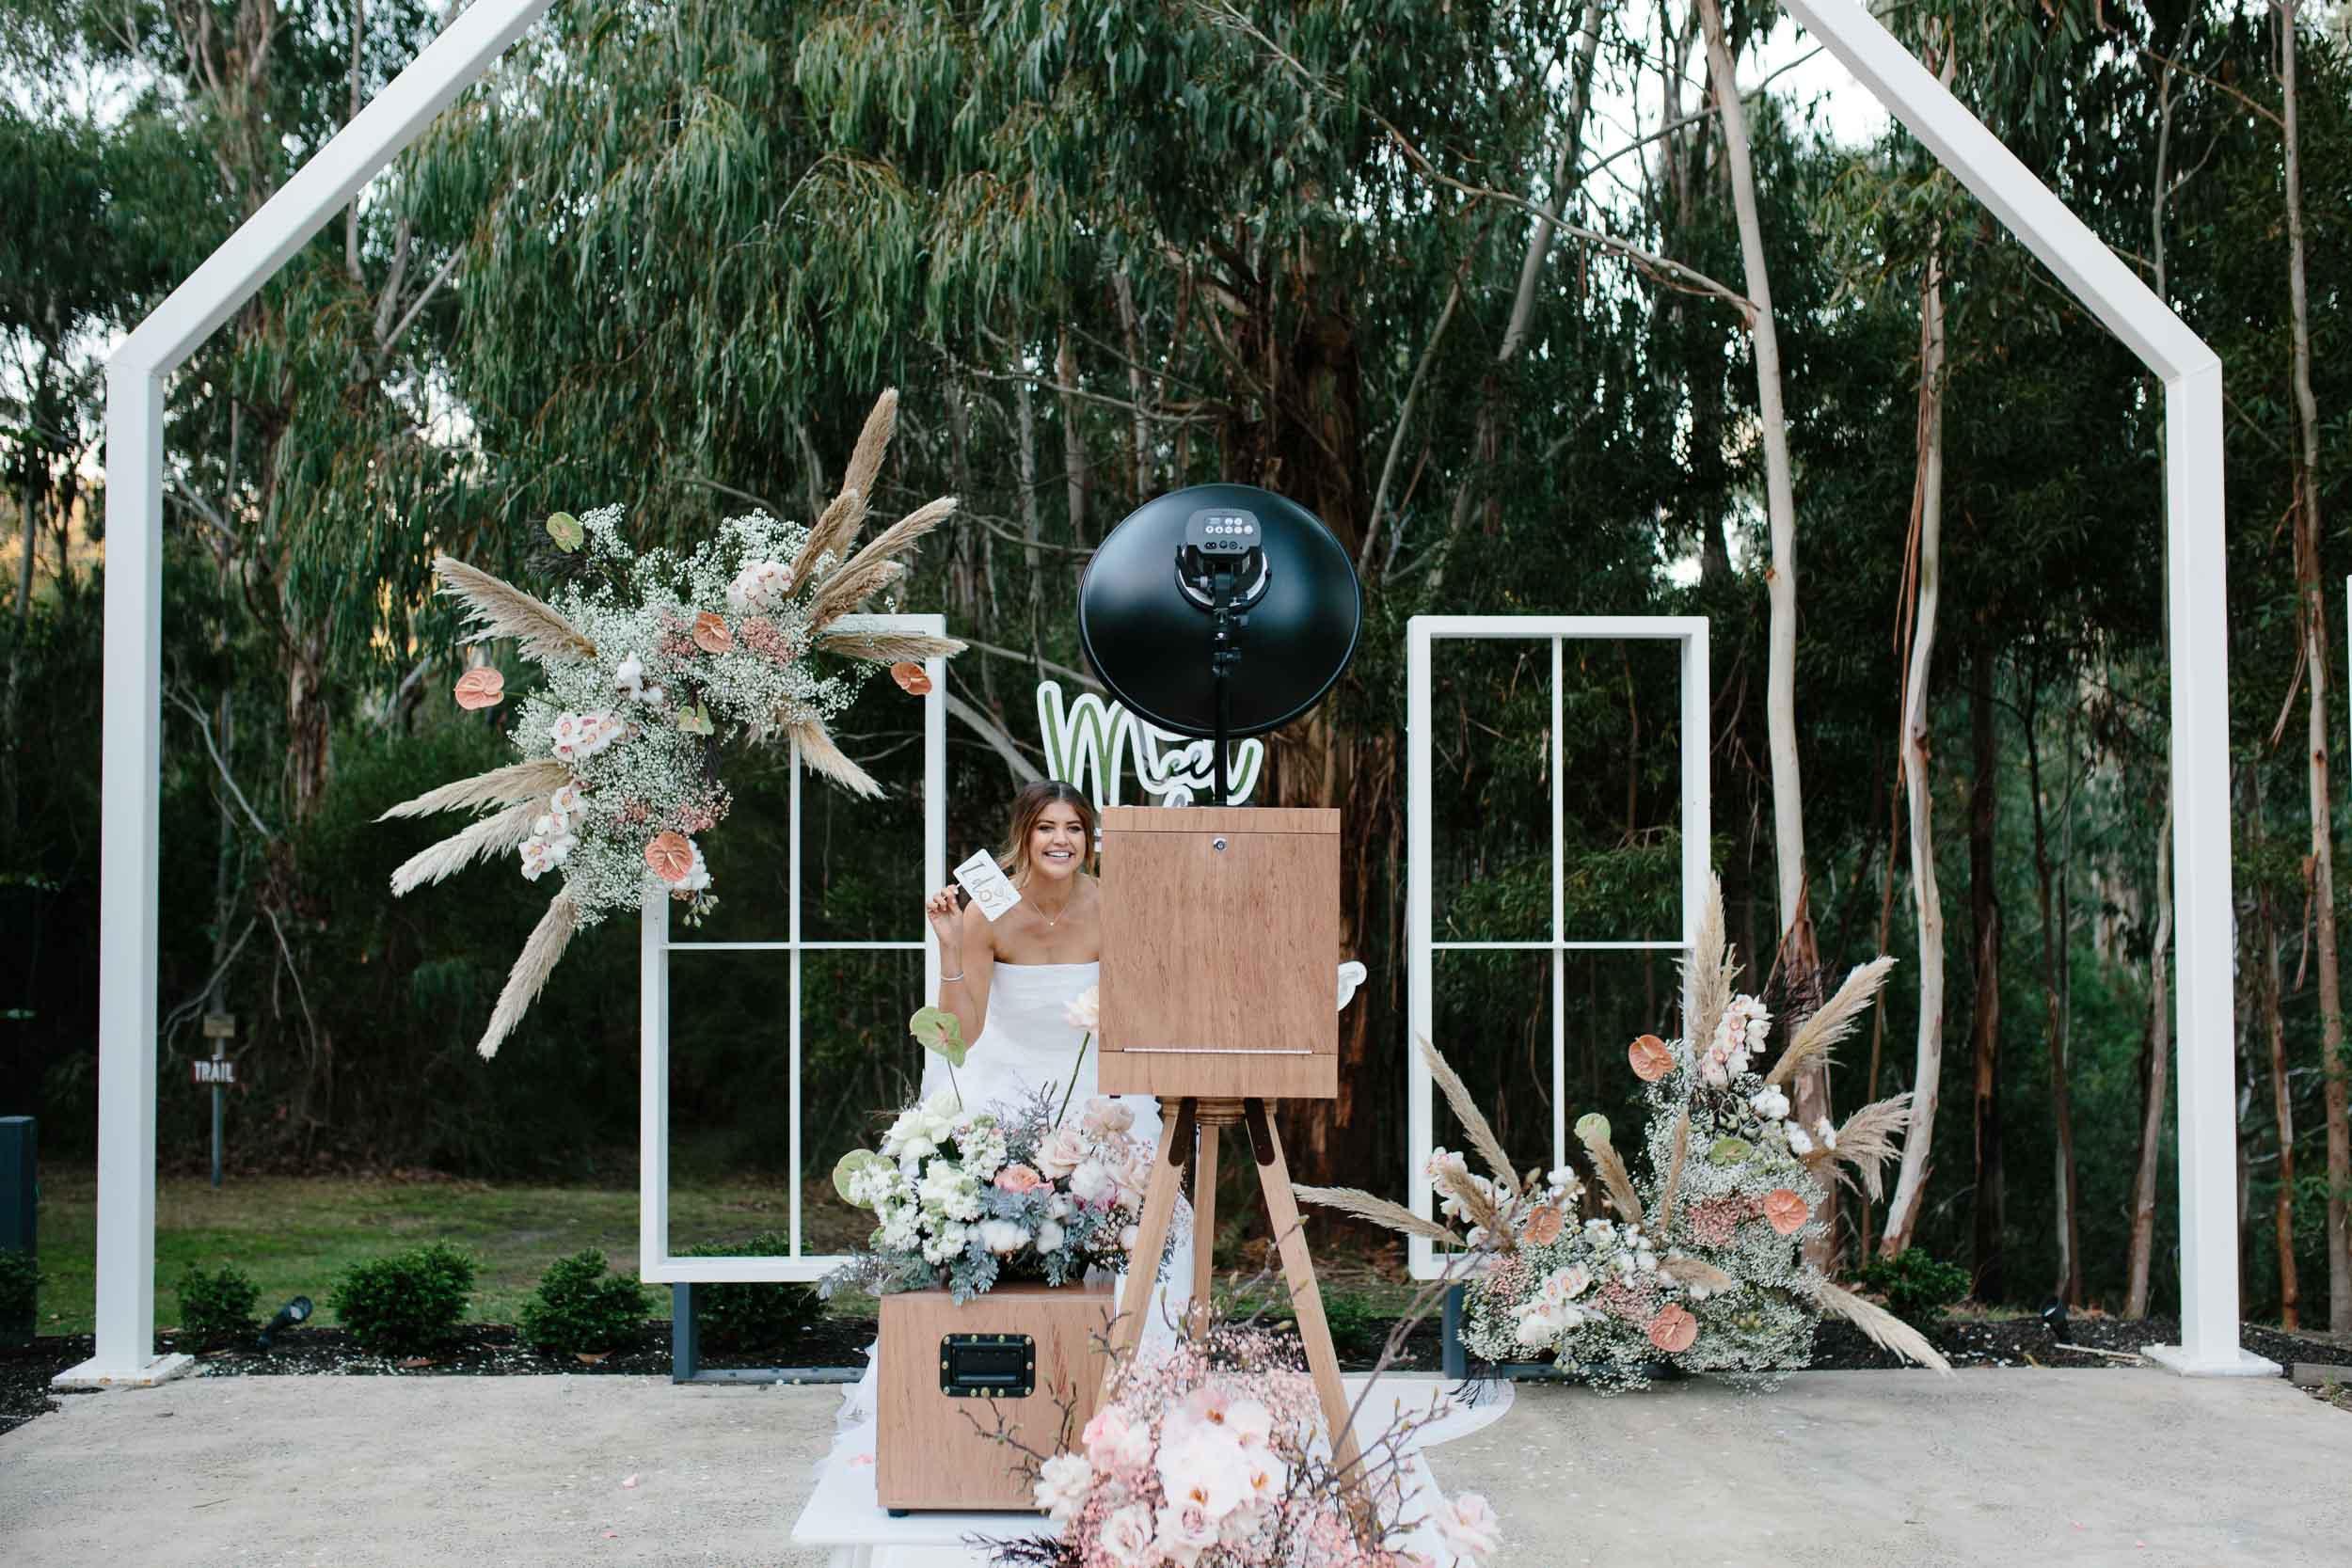 Kas-Richards-LENZO-Yarra-Valley-Wedding-One-Day-Bridal-390.jpg